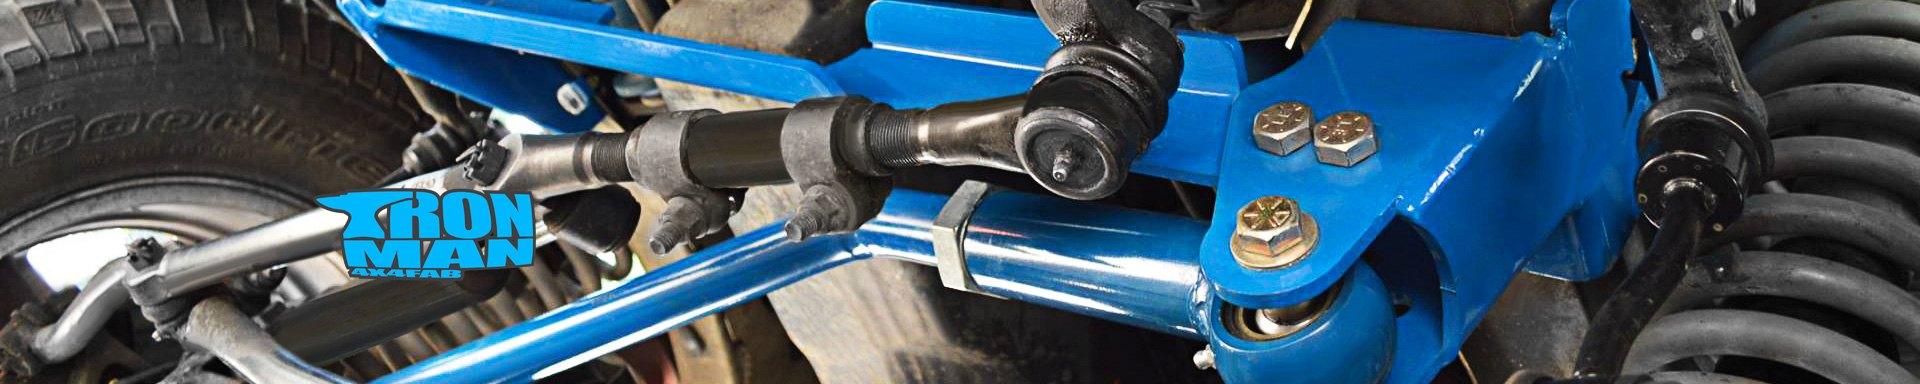 Ironman 4x4Fab™ | Jeep Suspension & Steering Parts, Mounts — CARiD com